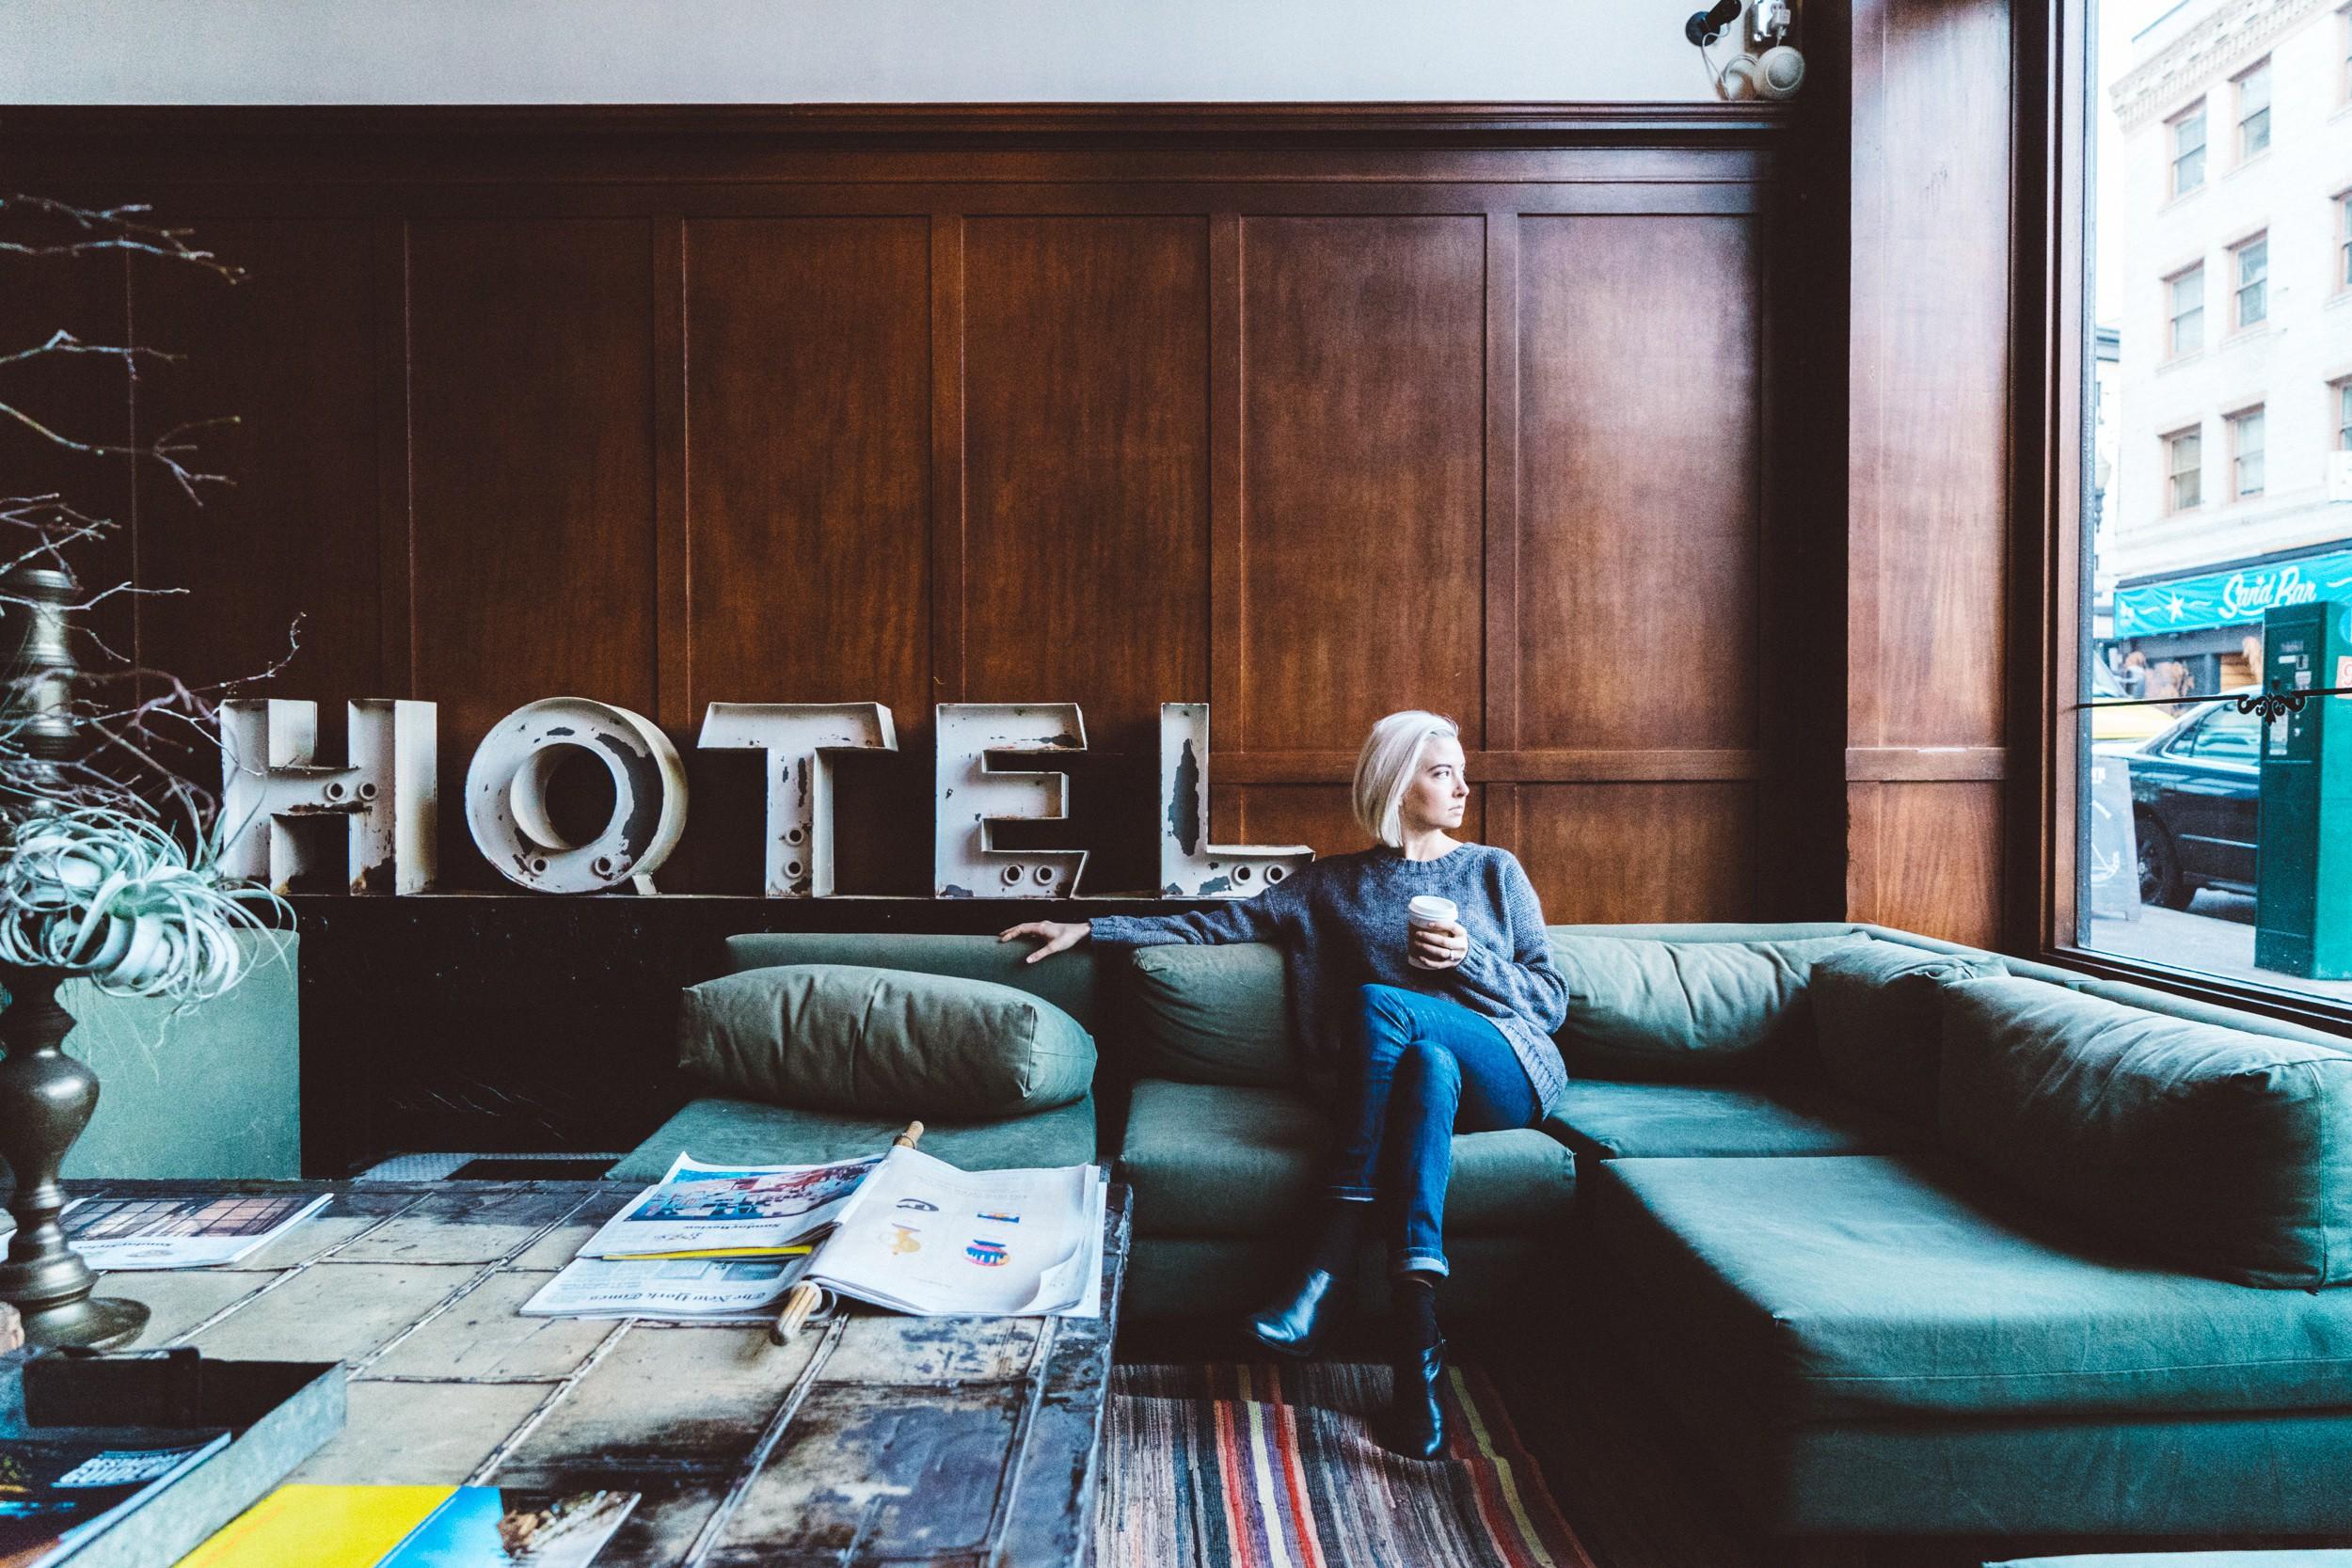 Woman sitting in hotel lobby | © Joshua Ness / StockSnap